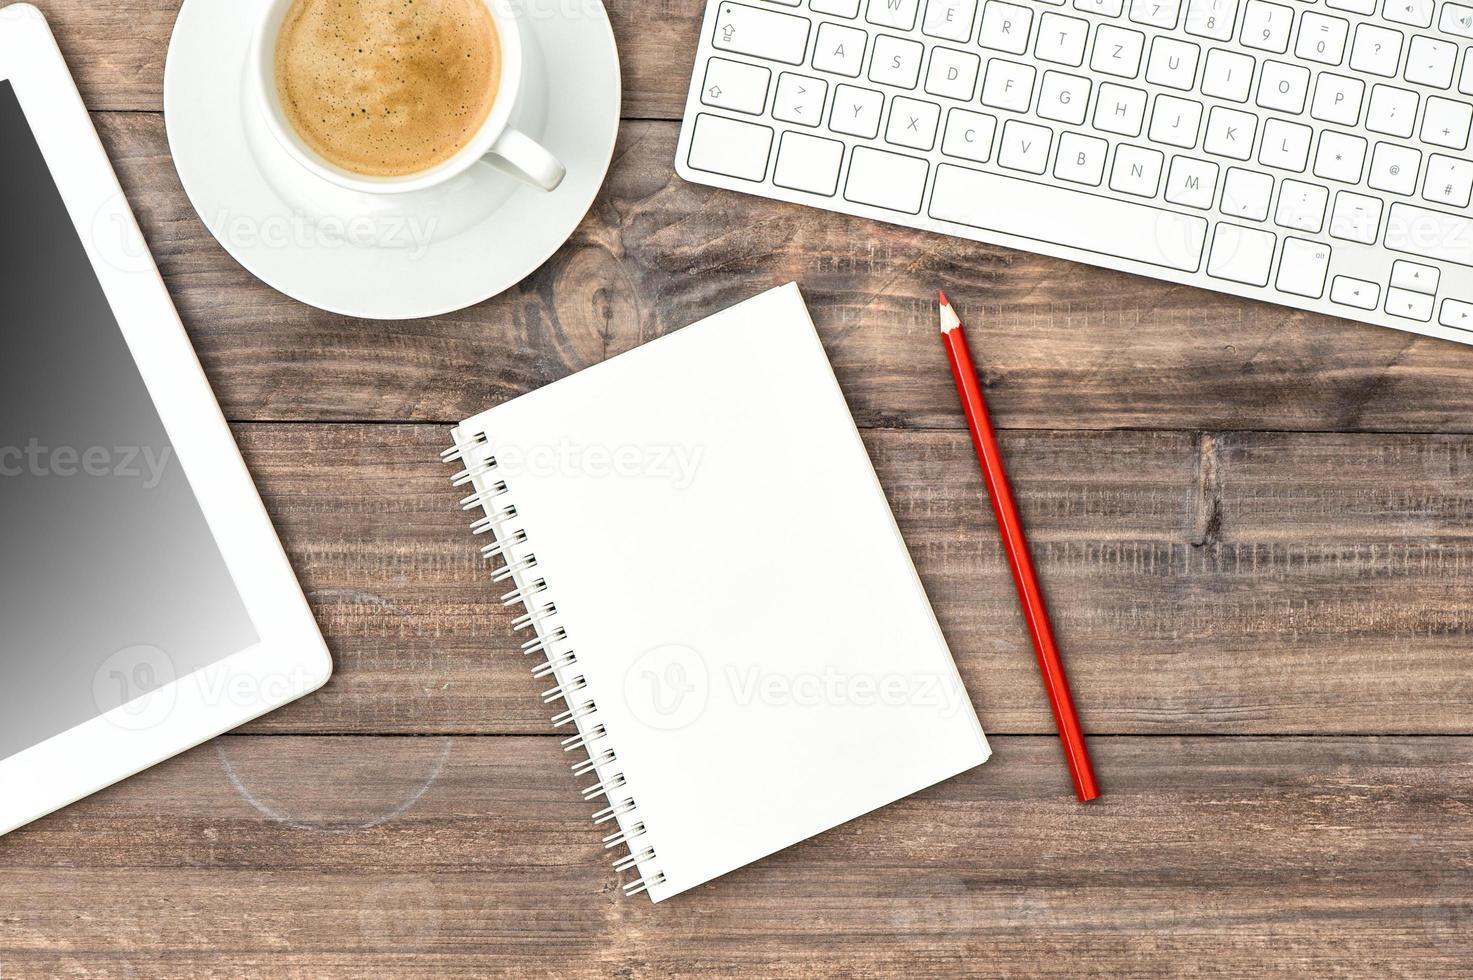 digitaler Tablet-PC, Tastatur und Tasse Kaffee. Heimbüro foto